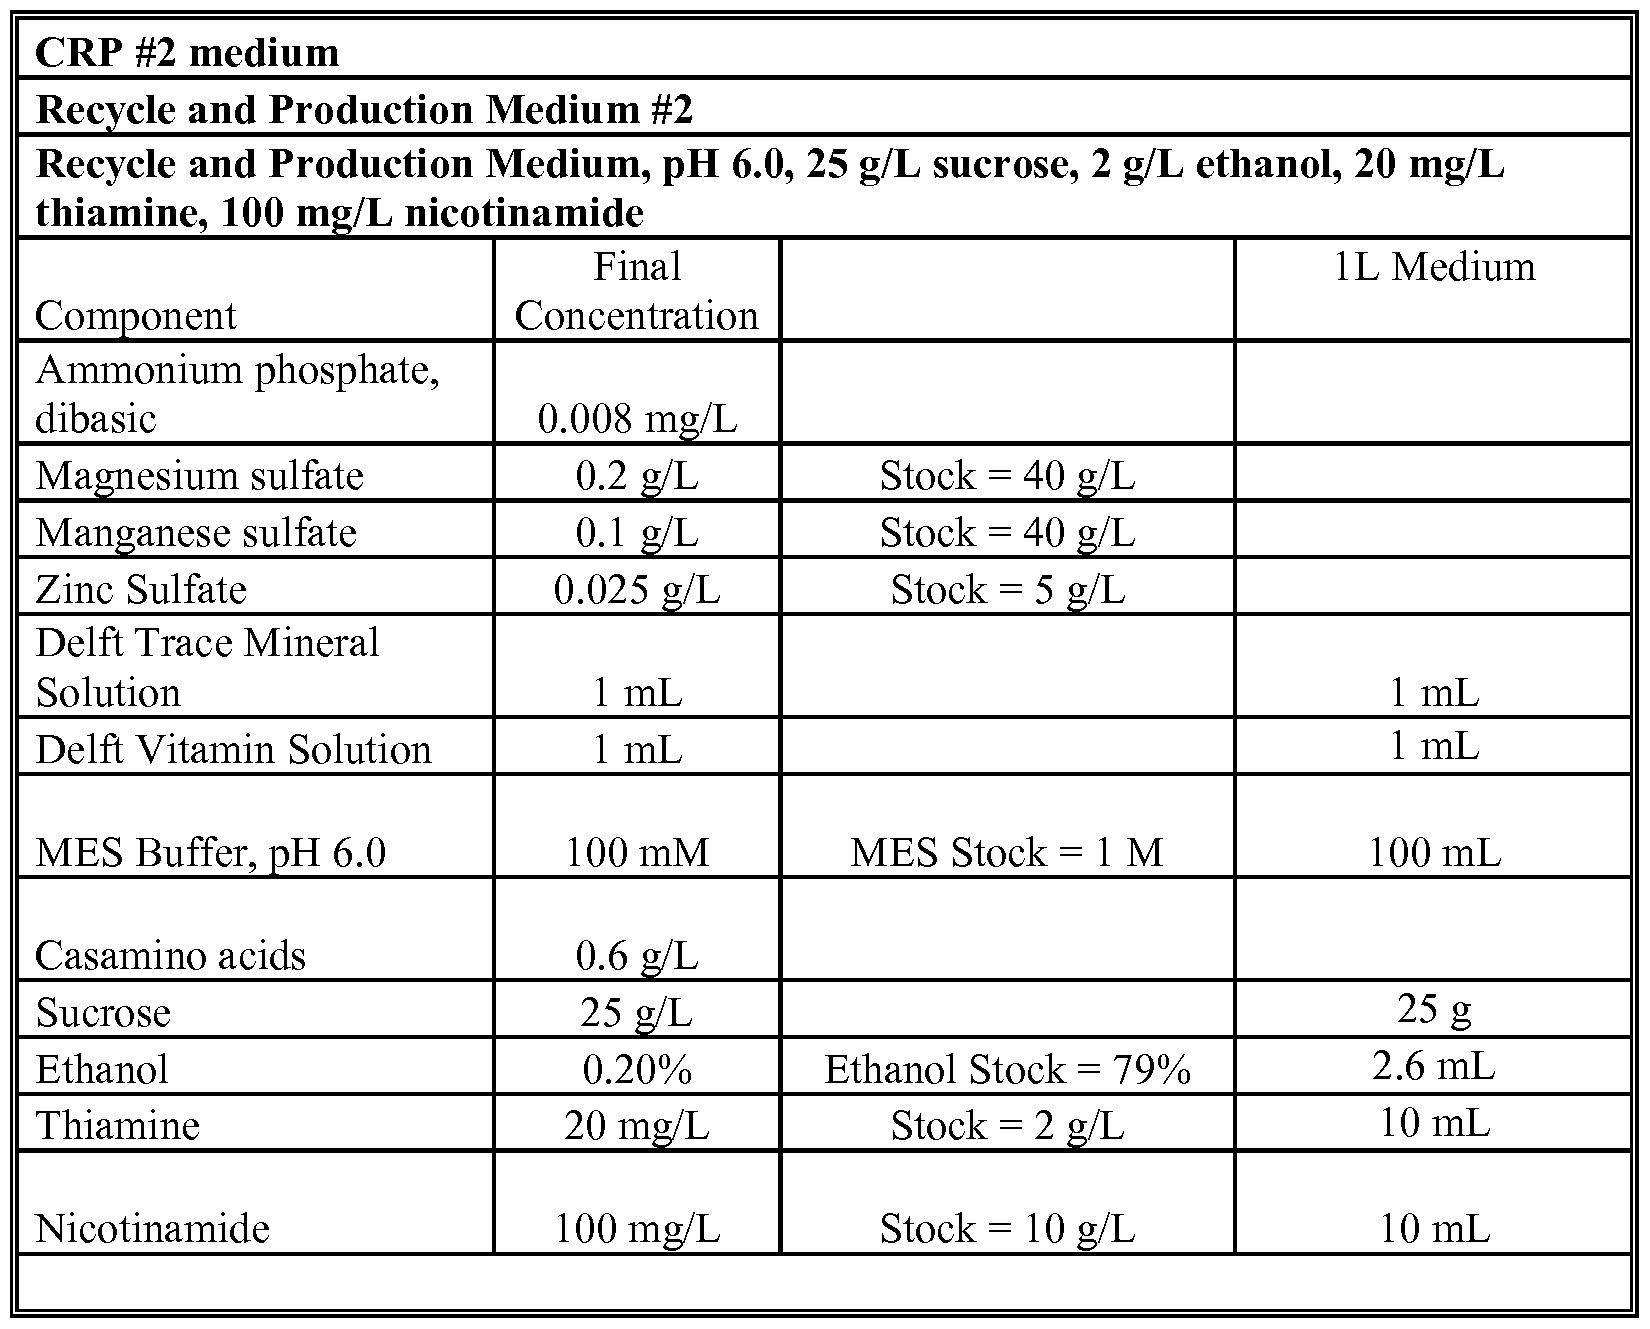 WO2013102084A2 - Fermentative production of alcohols